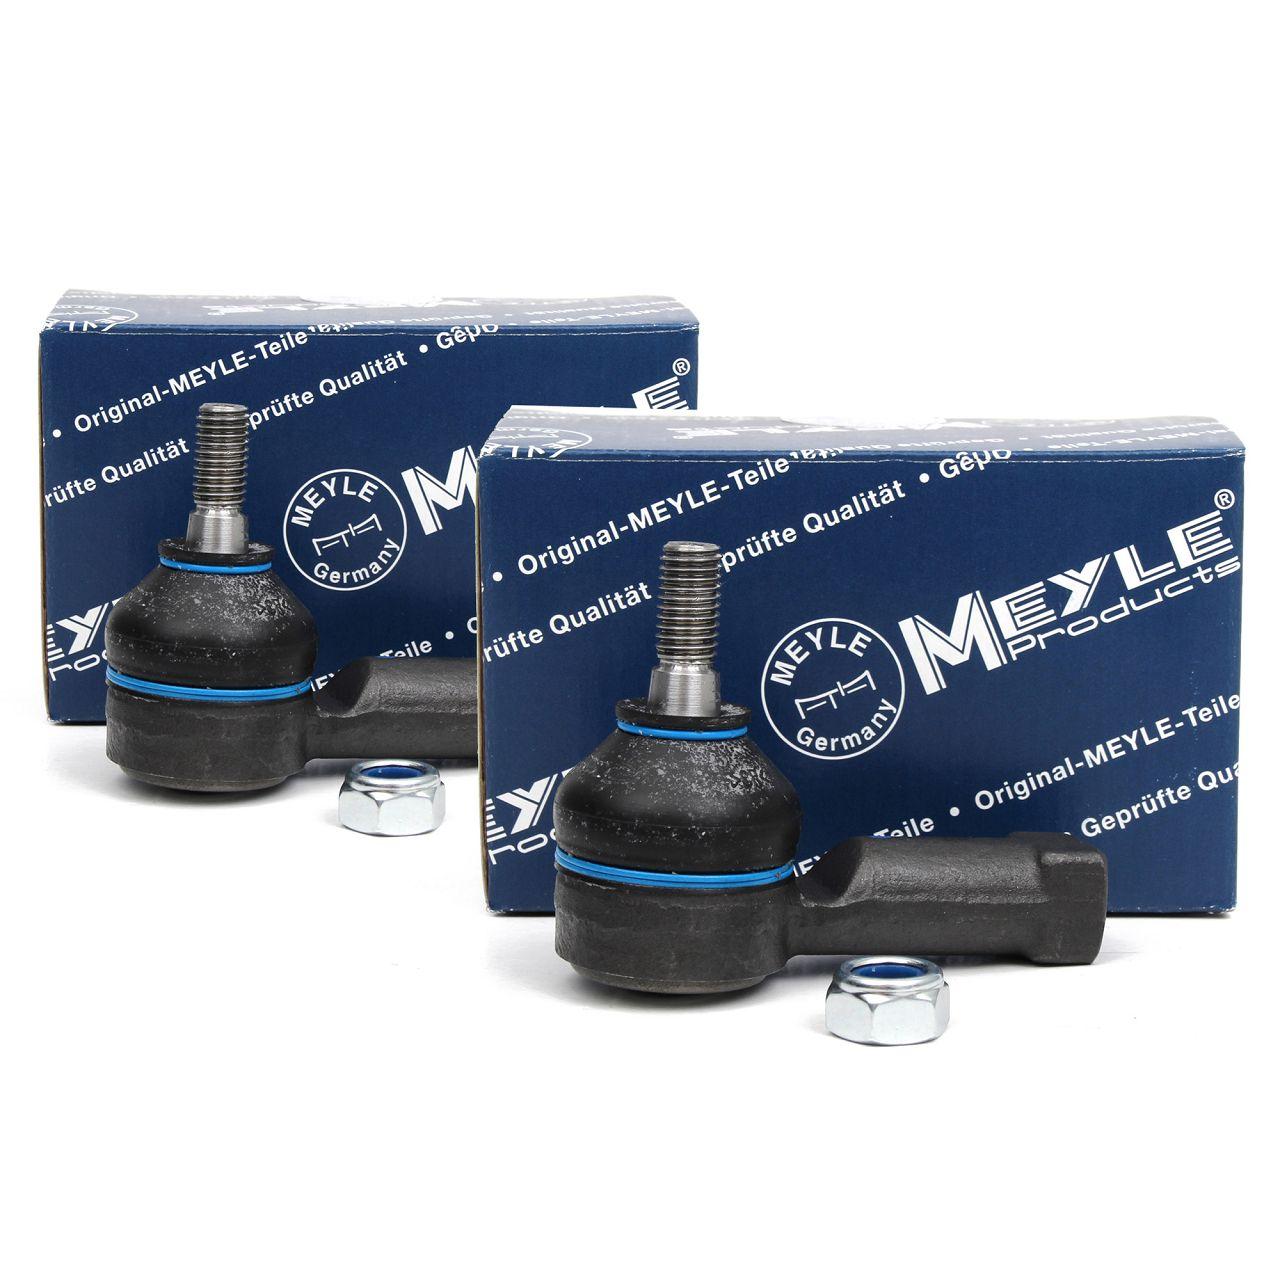 2x MEYLE Spurstangenkopf für Opel Combo Corsa A B C Tigra Smart ForTwo 451 vorne